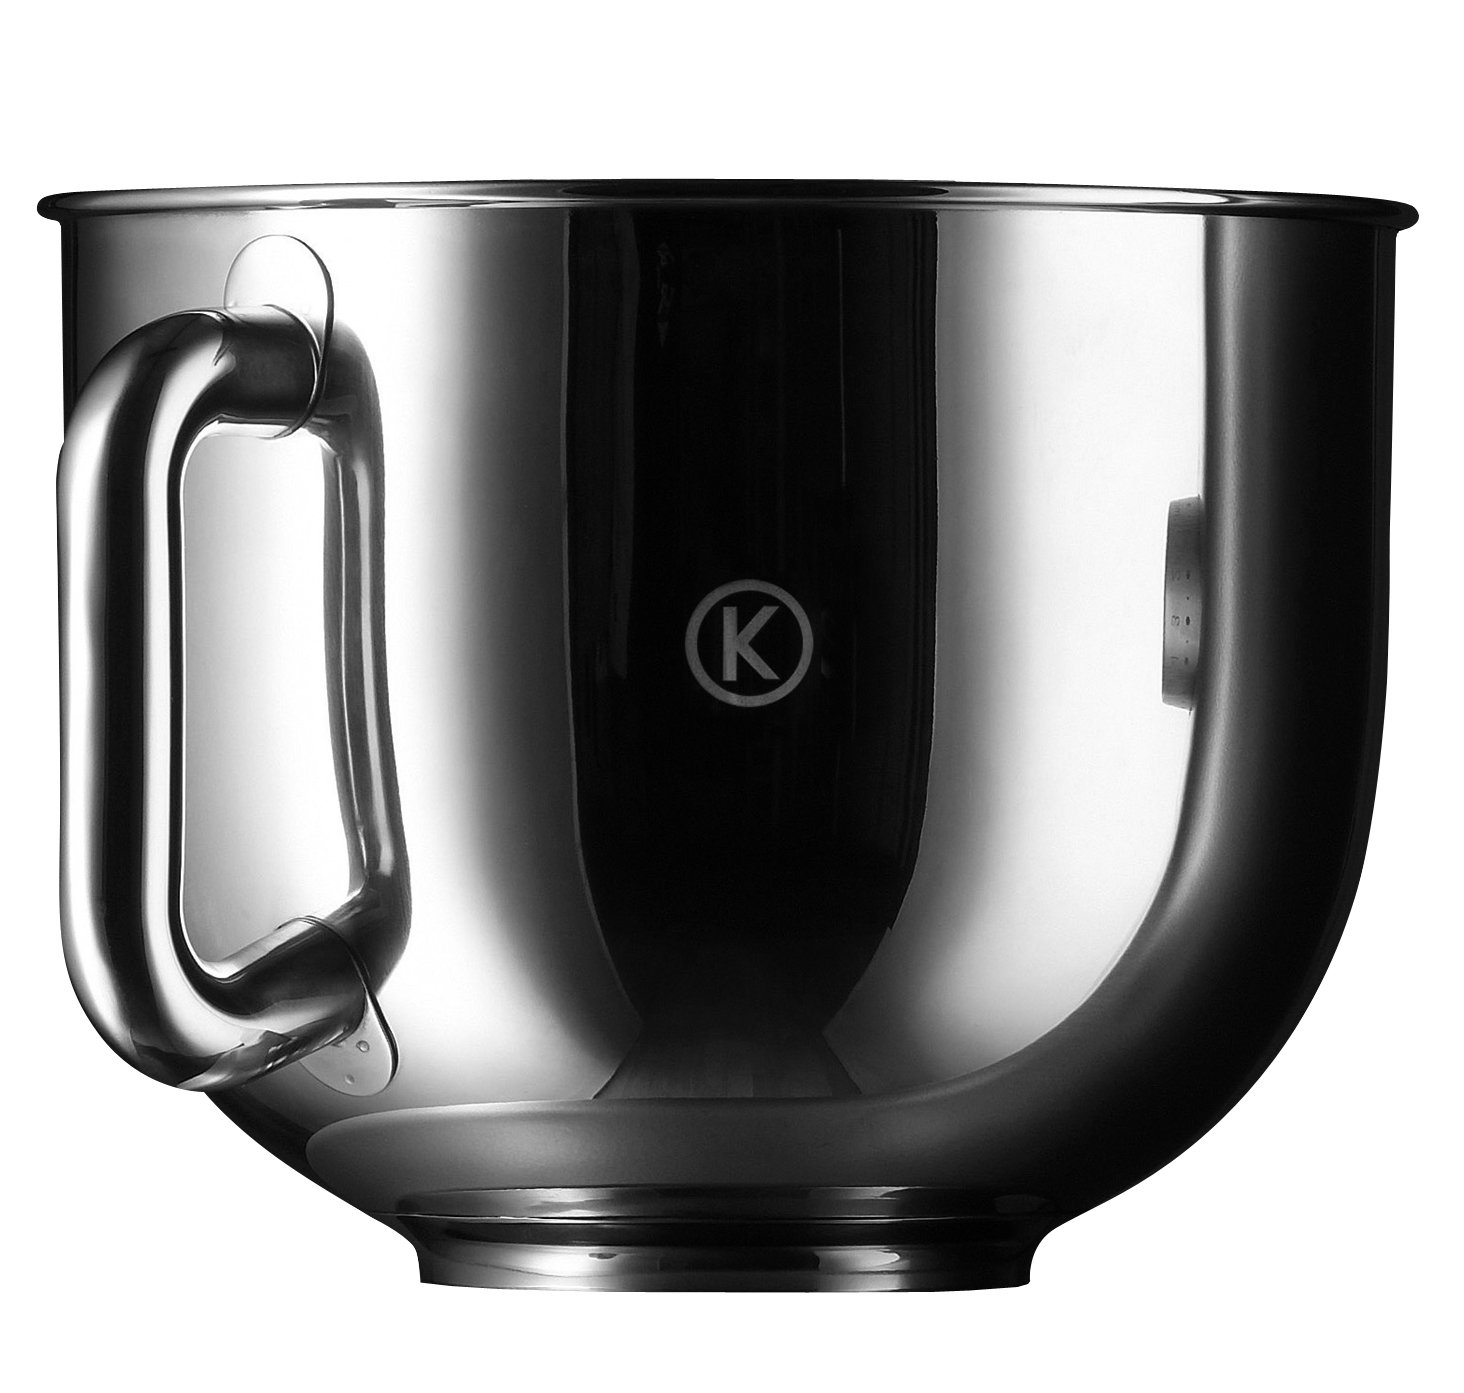 Kenwood-KMX-50-W-Kchenmaschine-kMix-500-Watt-wei